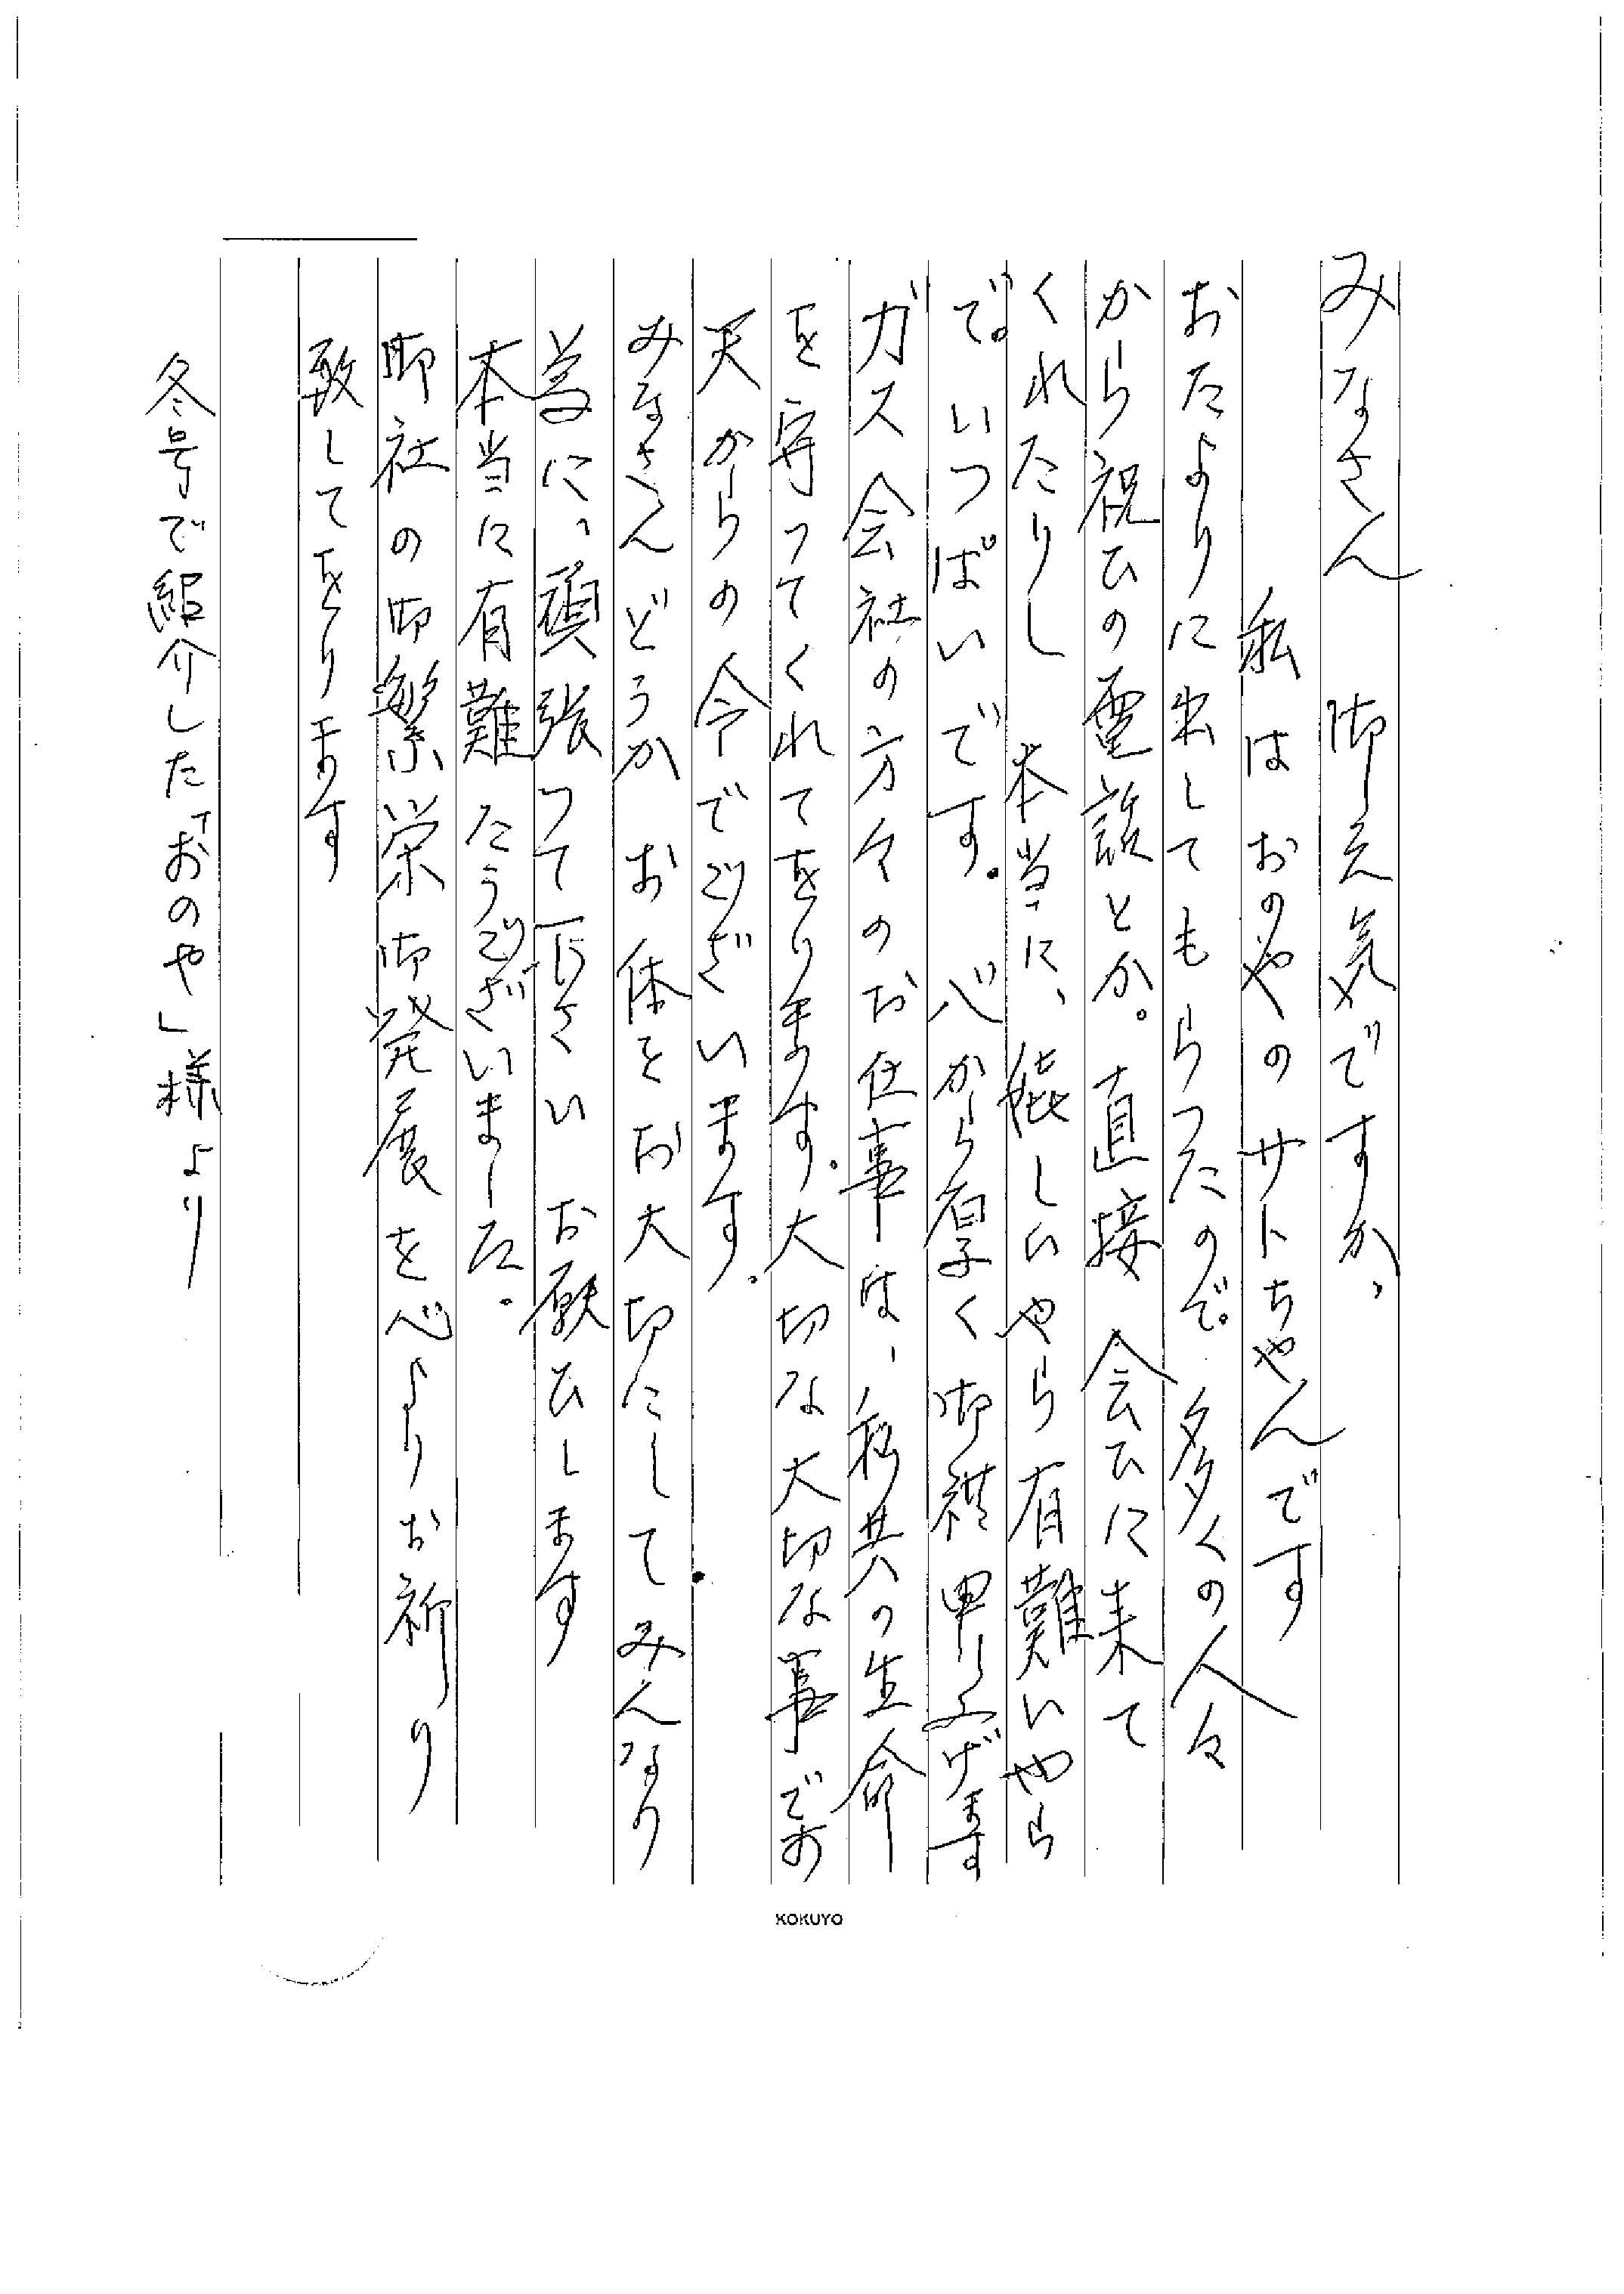 scan-251-1.jpg